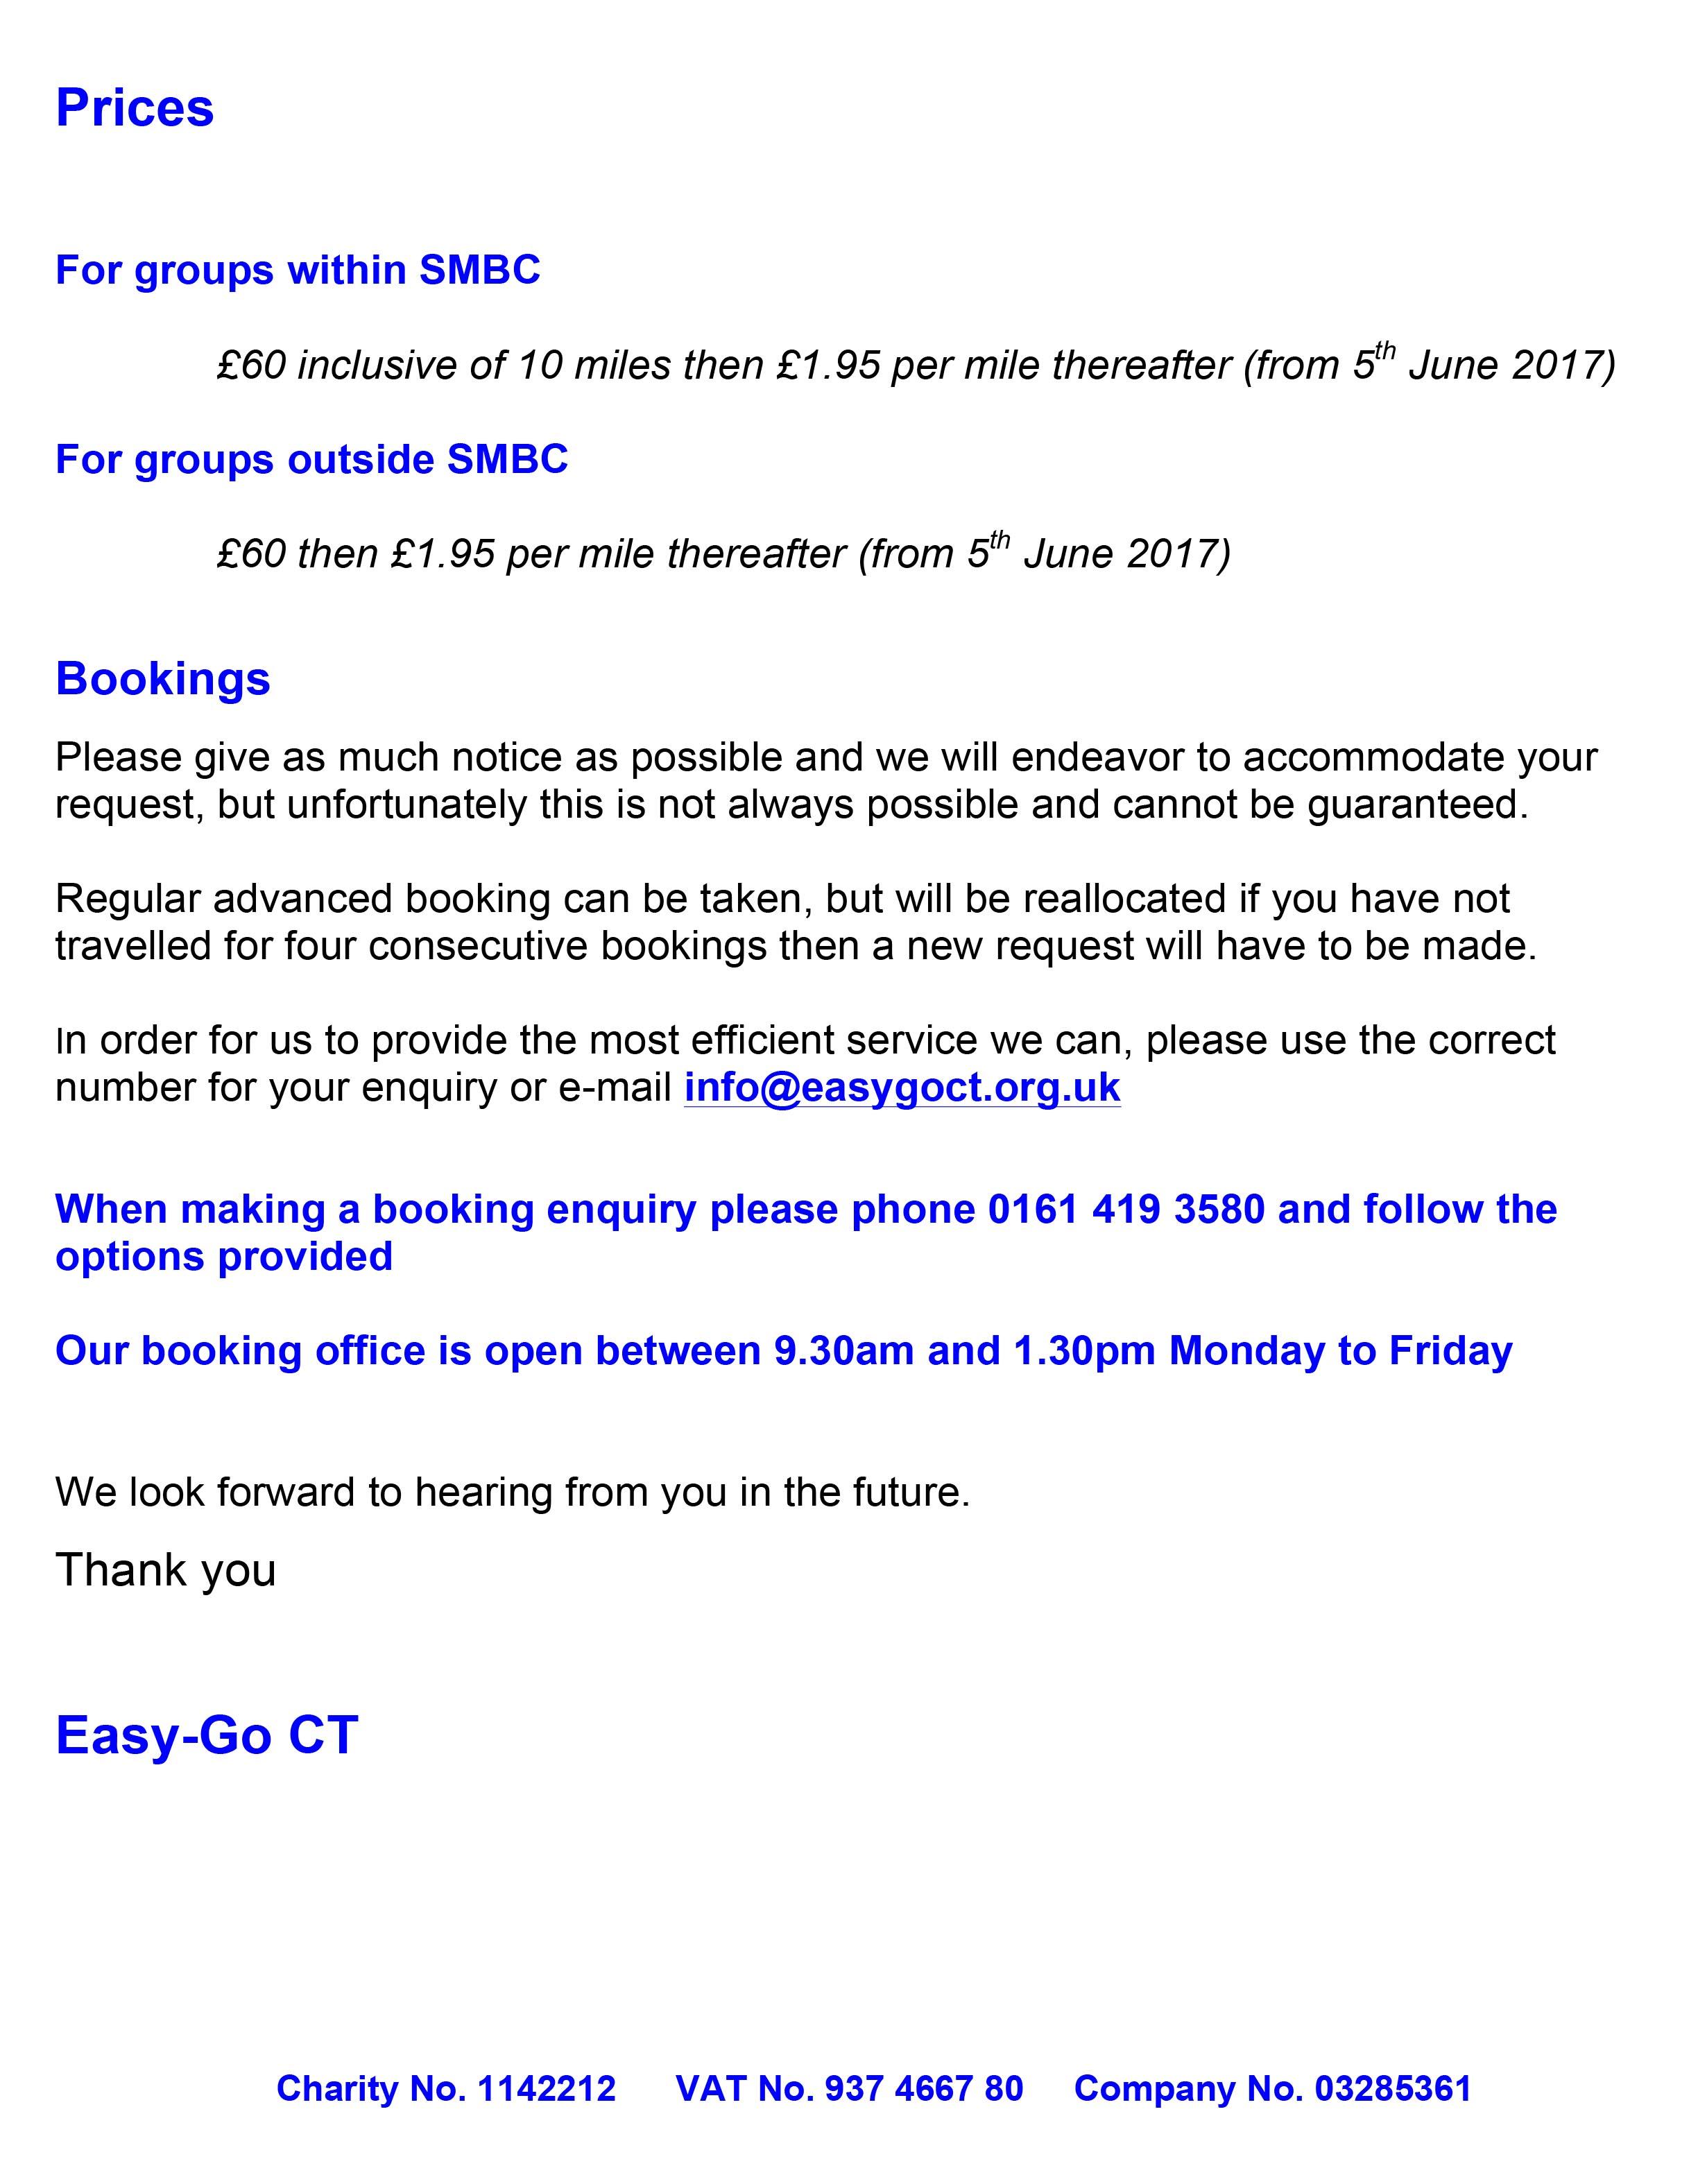 Easy Go CT - Stockport   Group Membership Letter